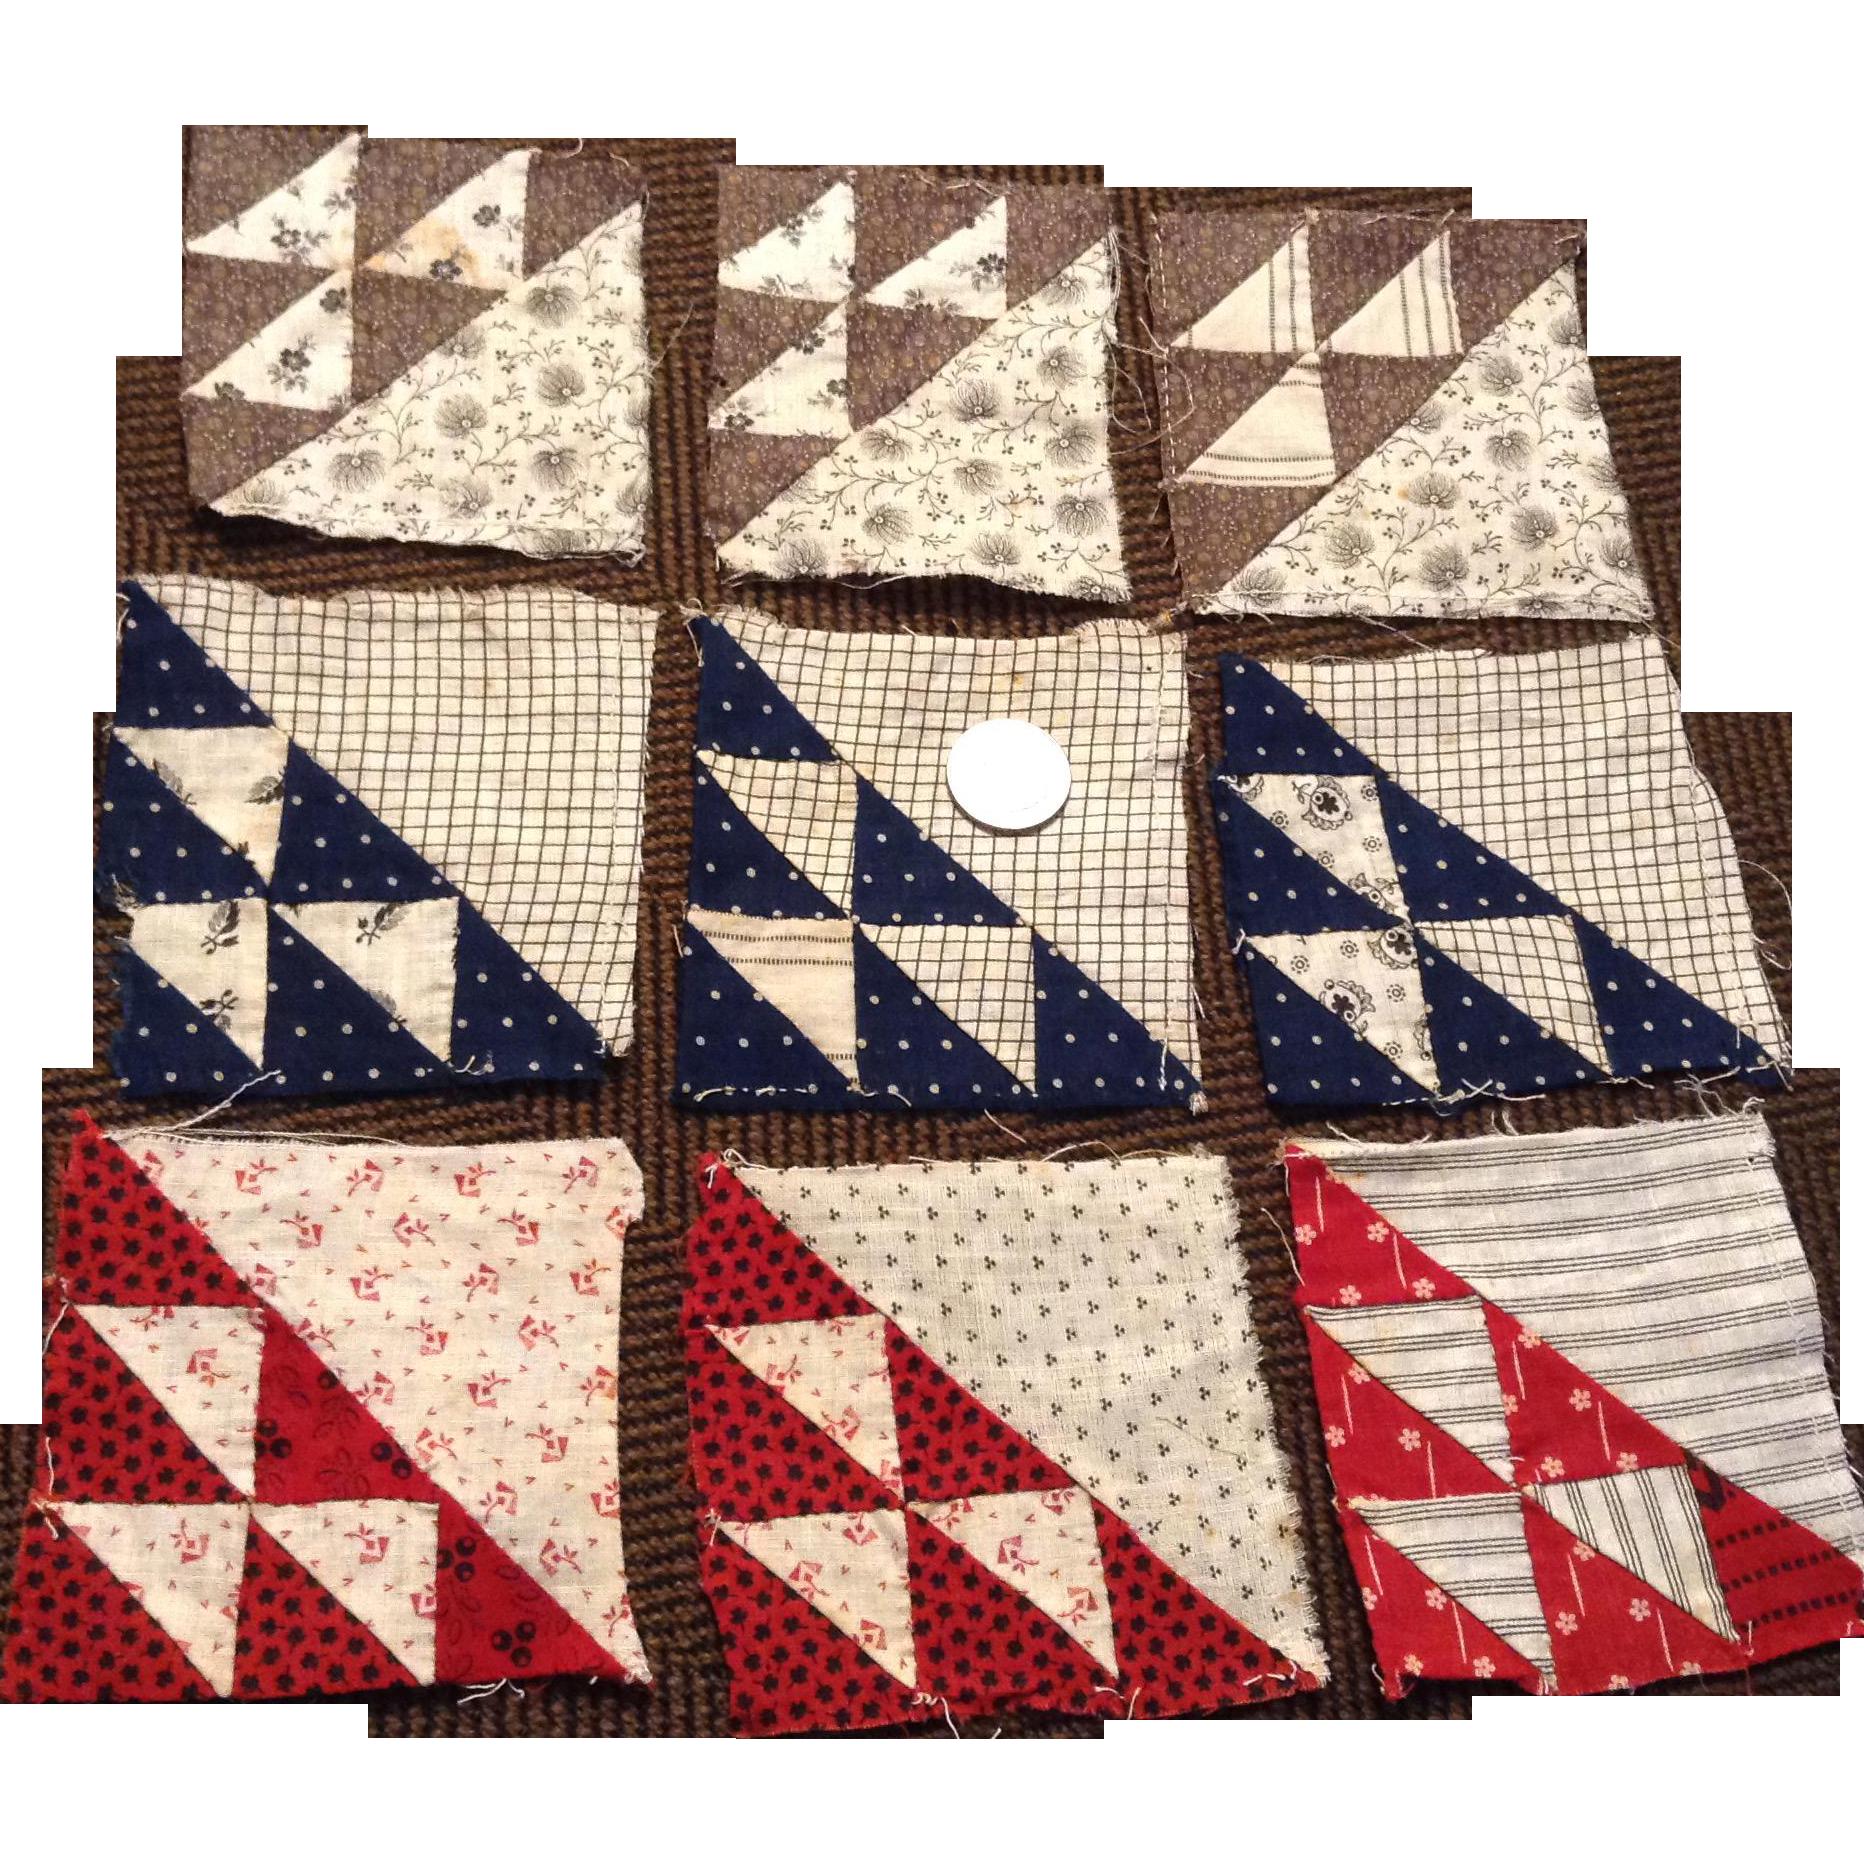 9 Small Hand Pieced Antique Quilt Squares